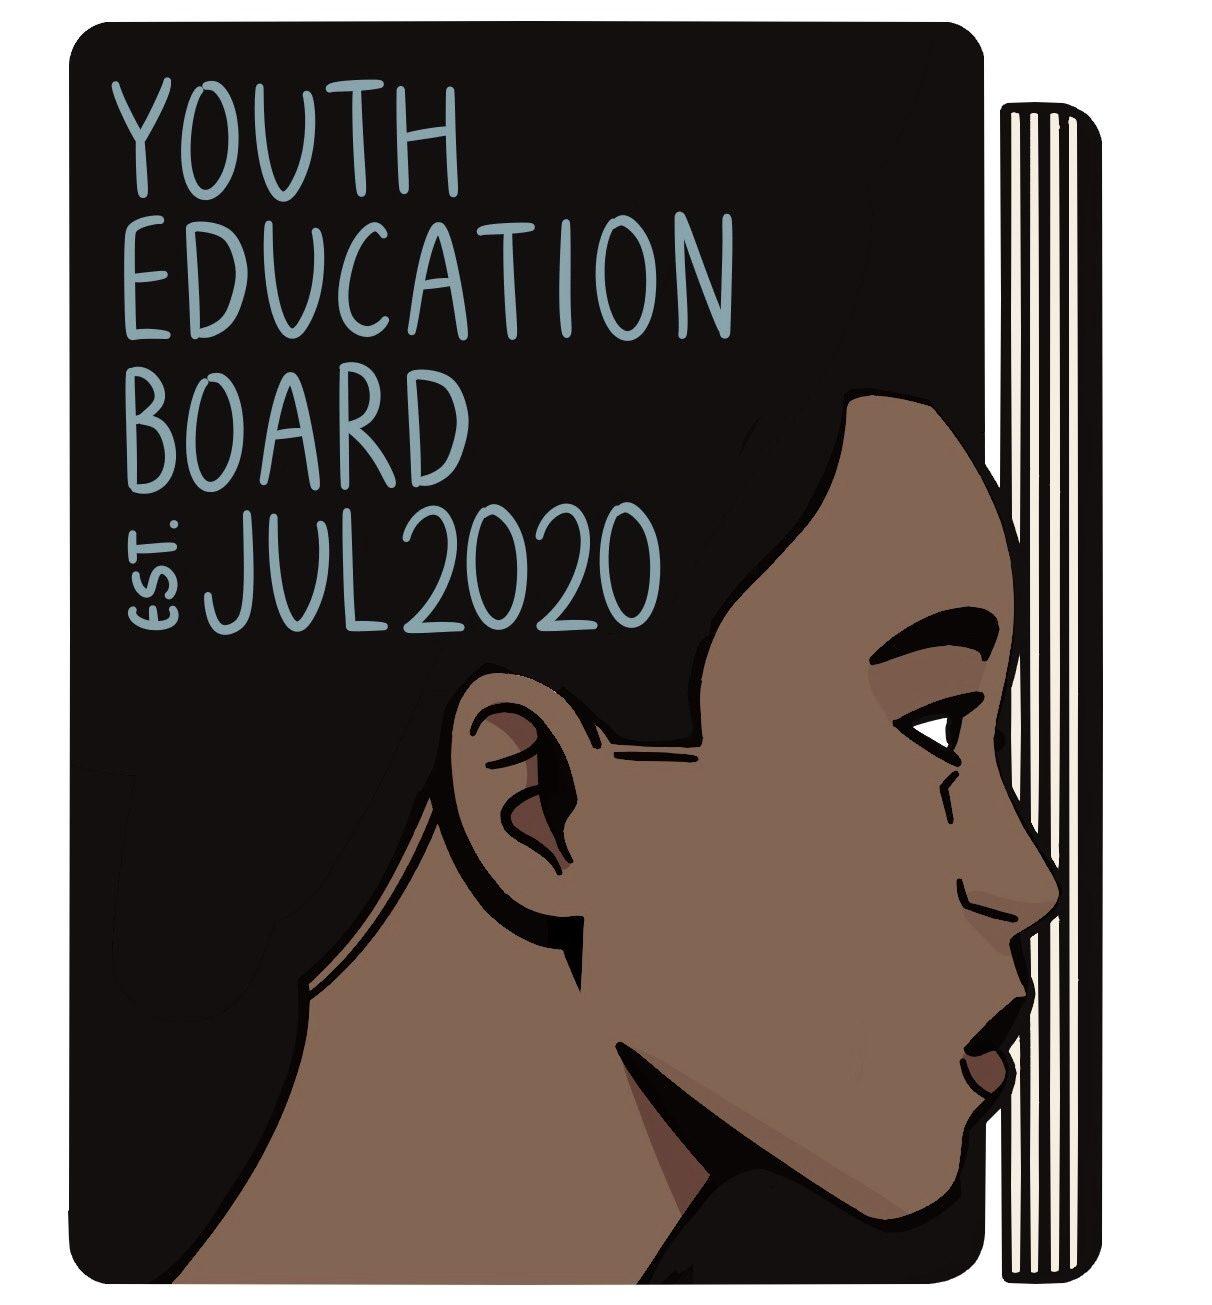 Youth Education Board